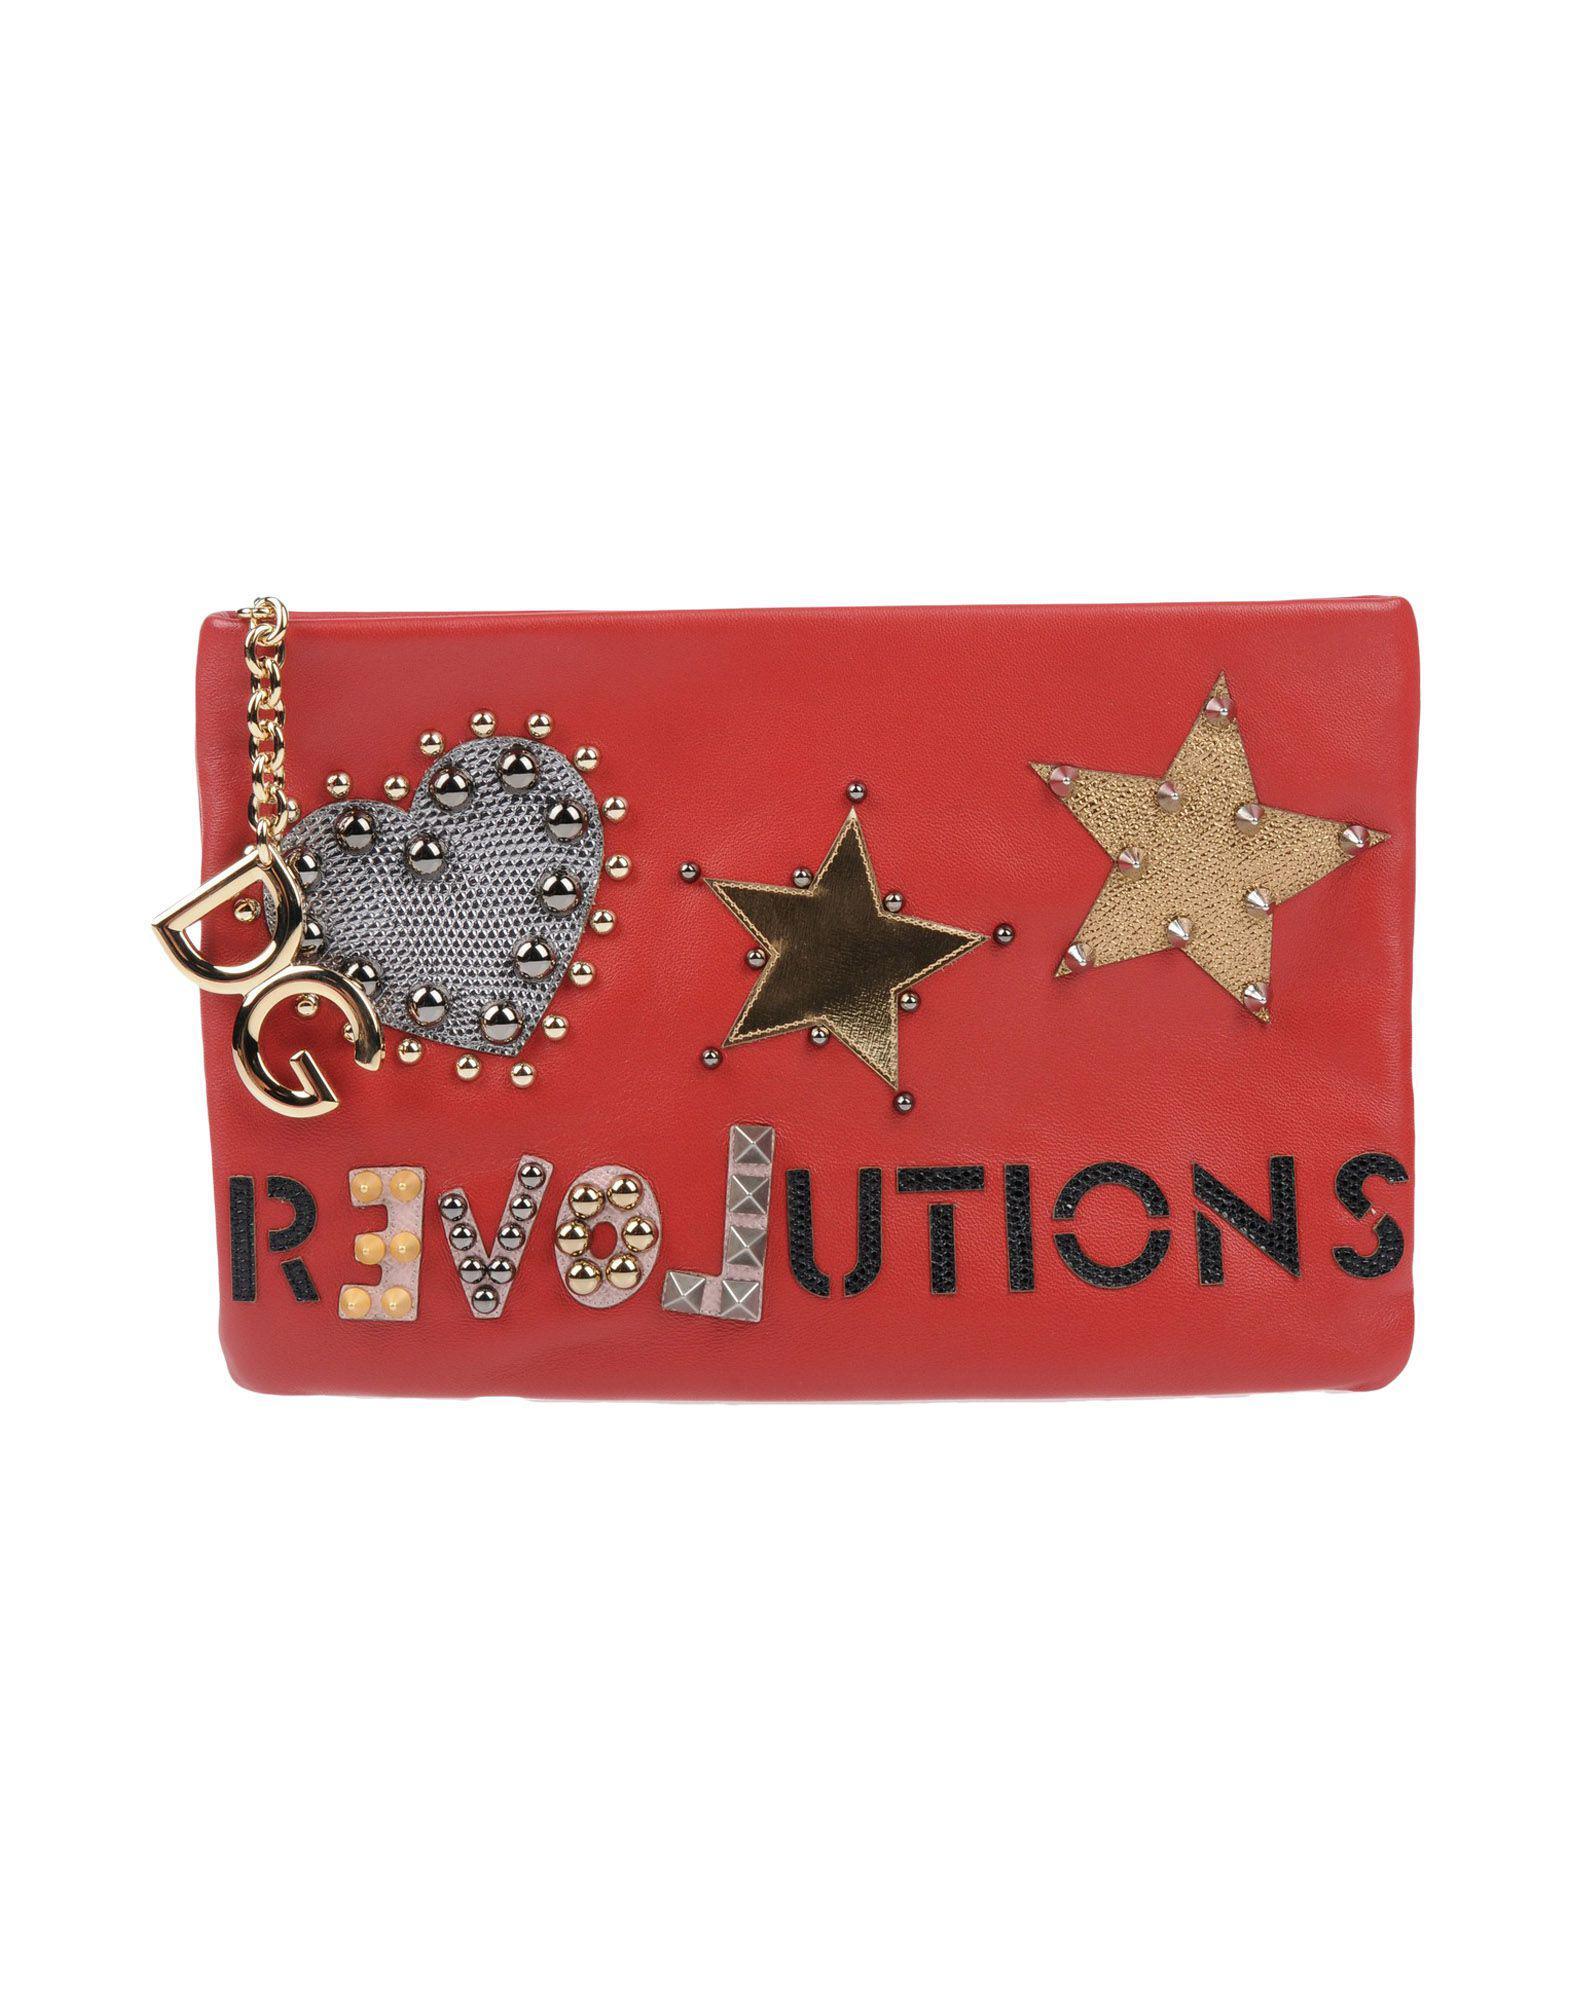 149b1ee96115 Lyst - Dolce   Gabbana Handbag in Red - Save 1%